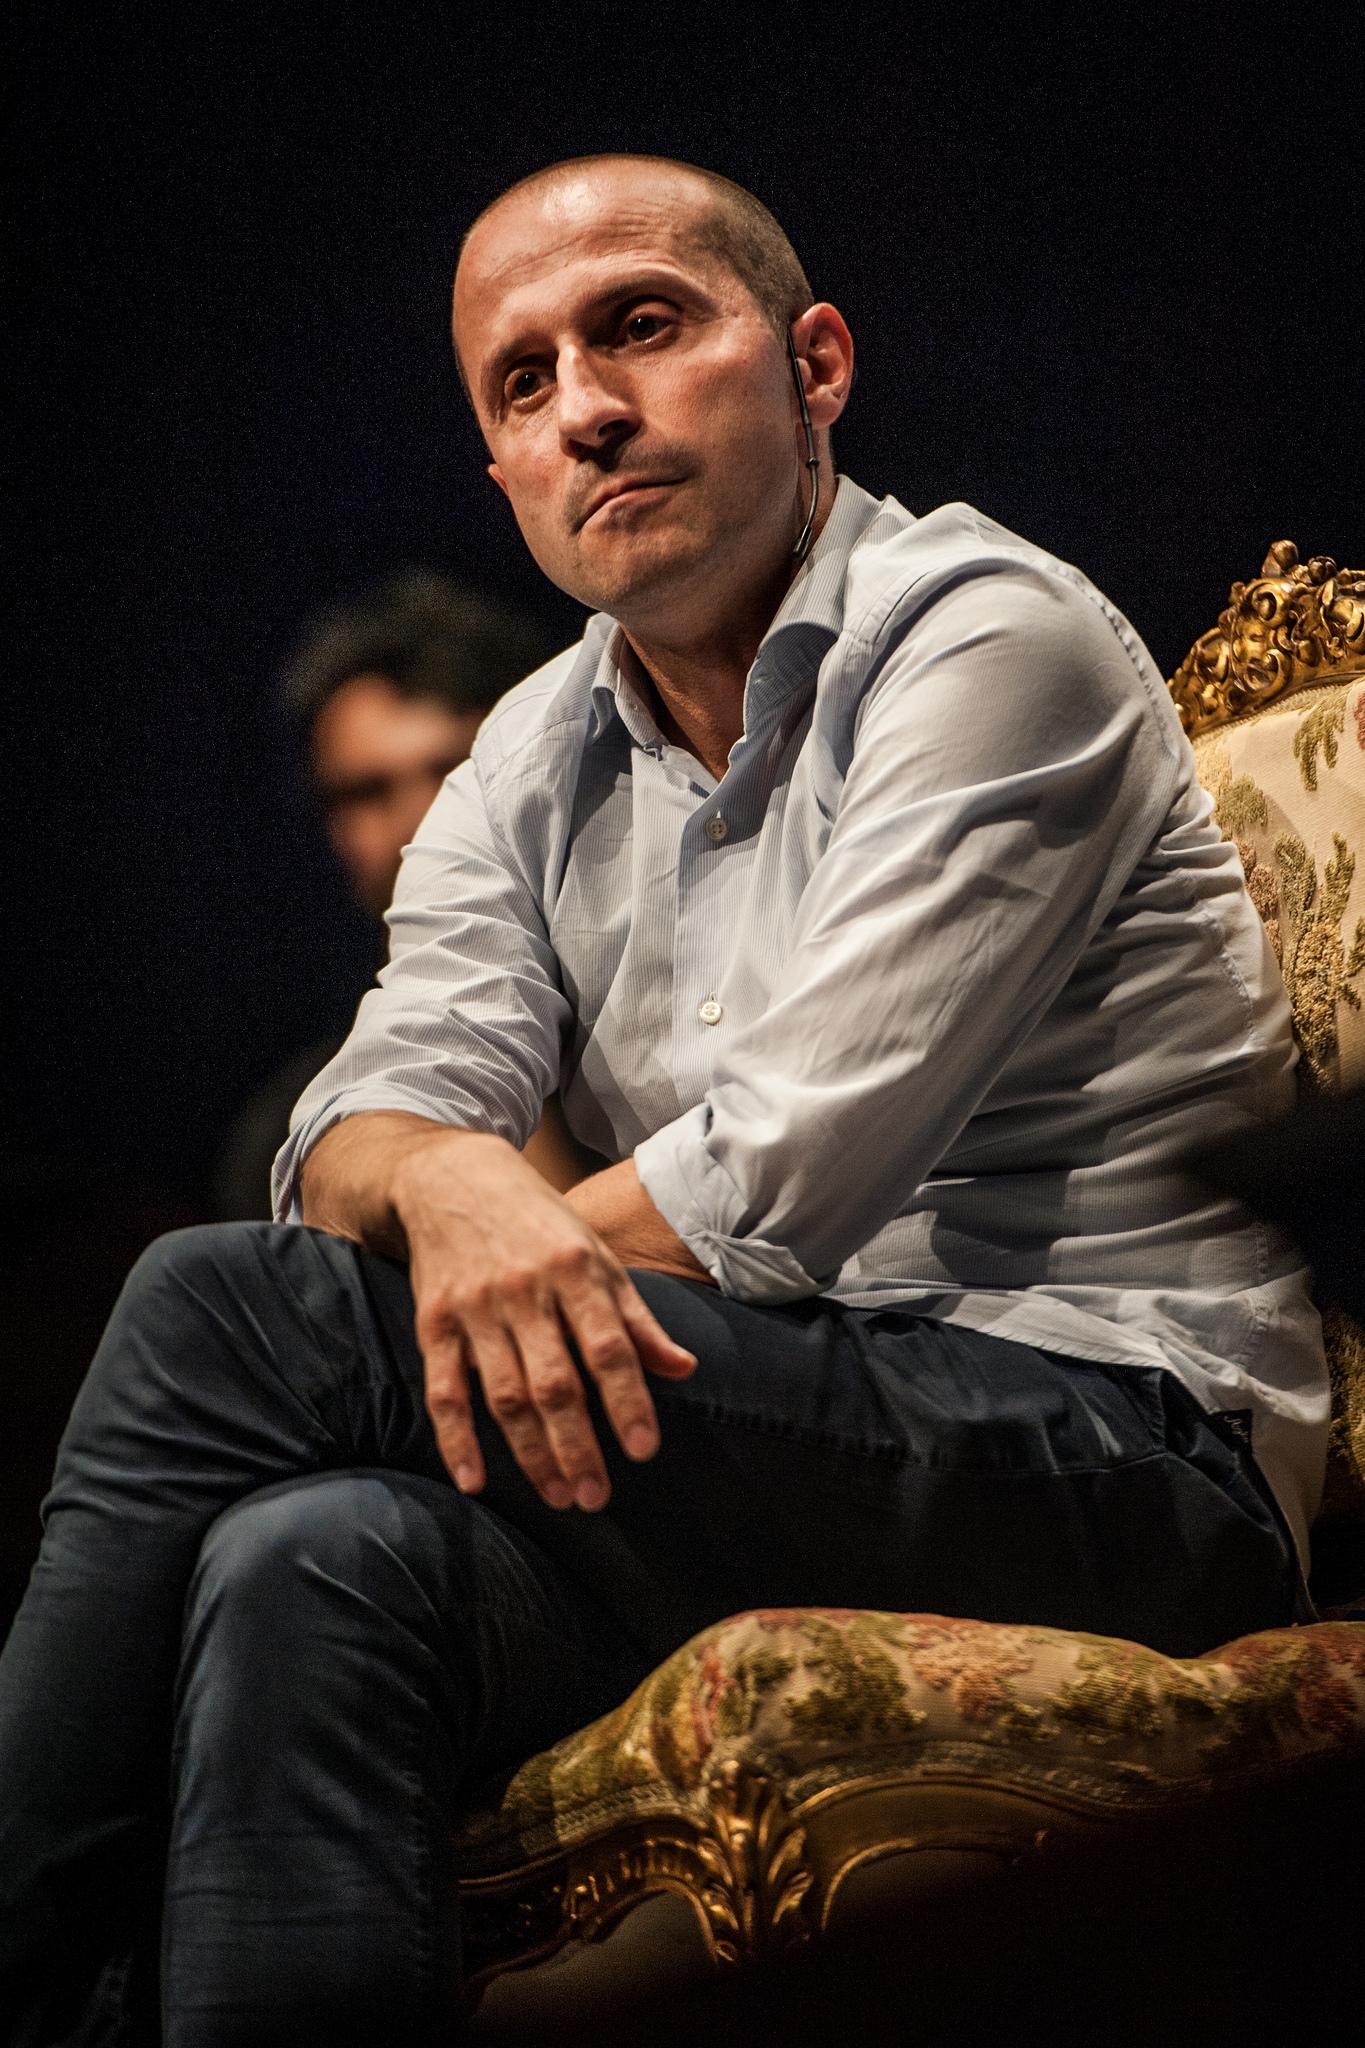 Massimo Mancini